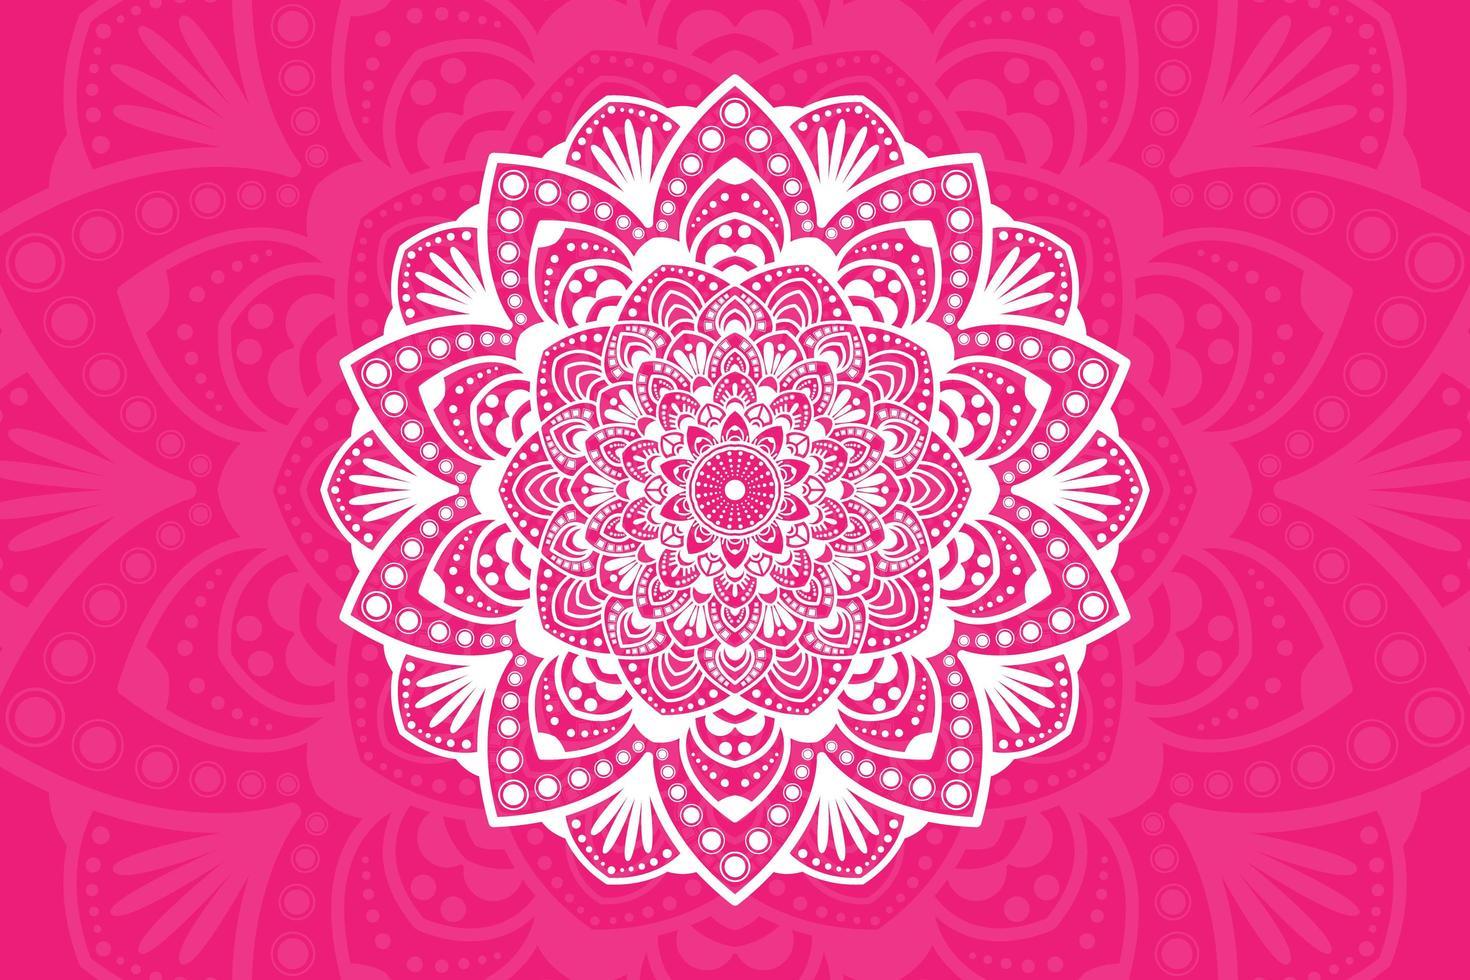 weißes Blumenmandala-Design auf Rosa vektor